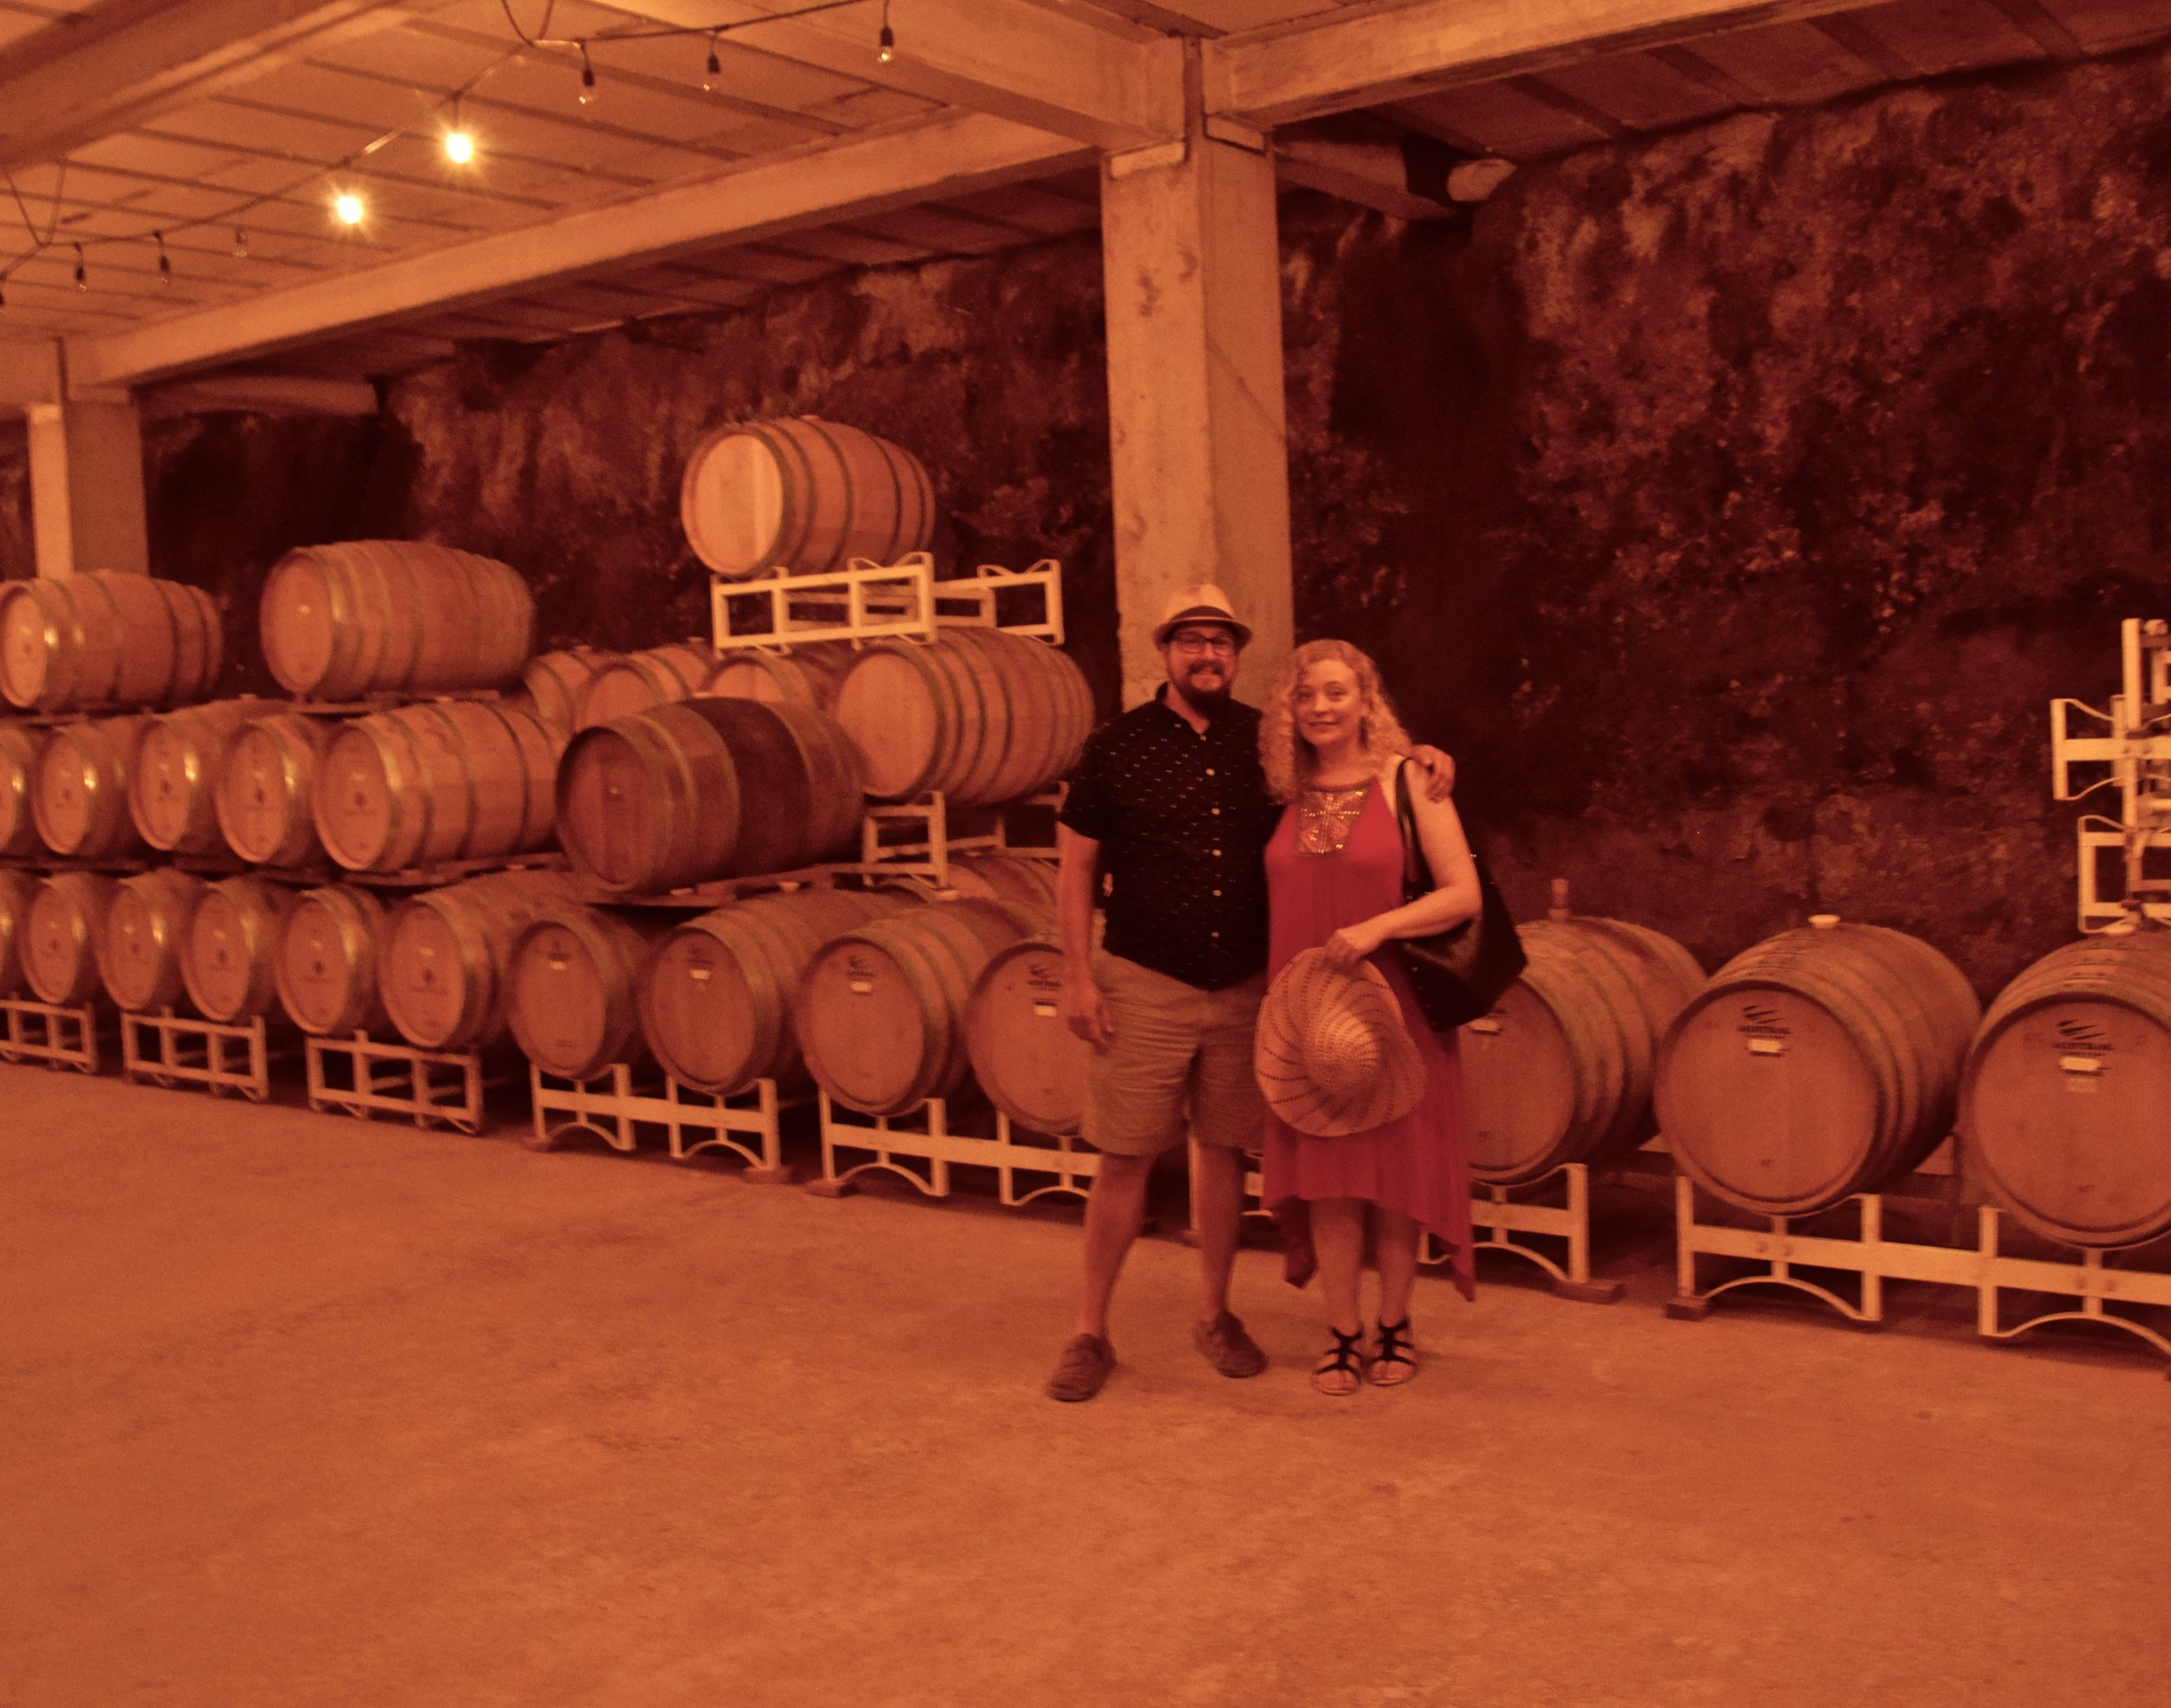 baron belch'e- joanna & gabe infront of barrels.jpg